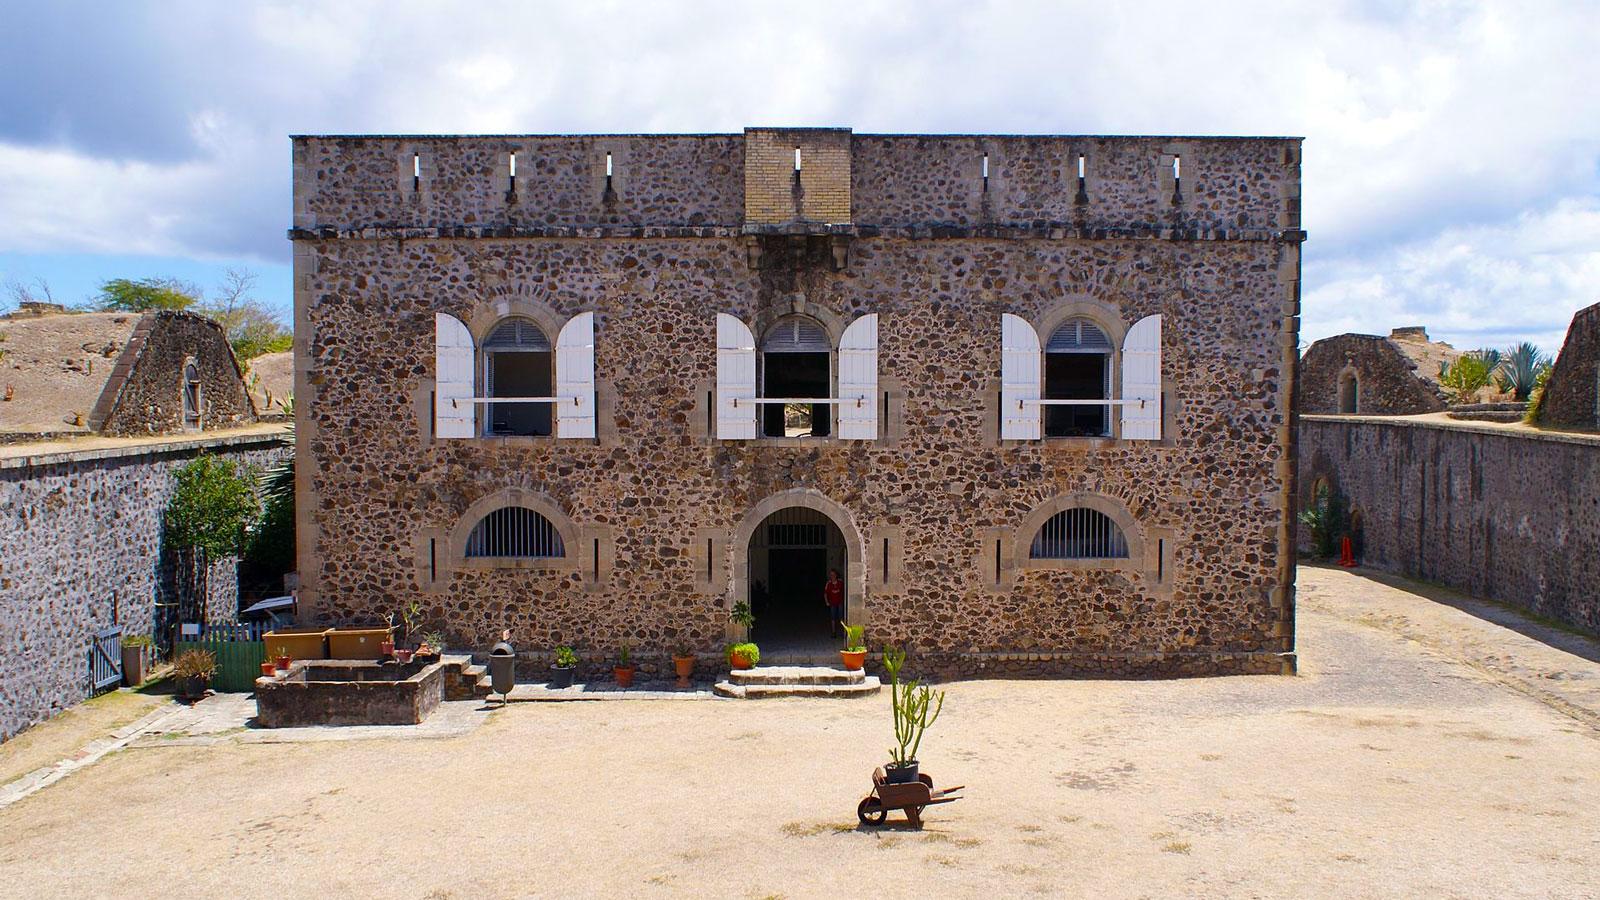 Bild vom Fort Napoleon des Saintes auf Guadeloupe